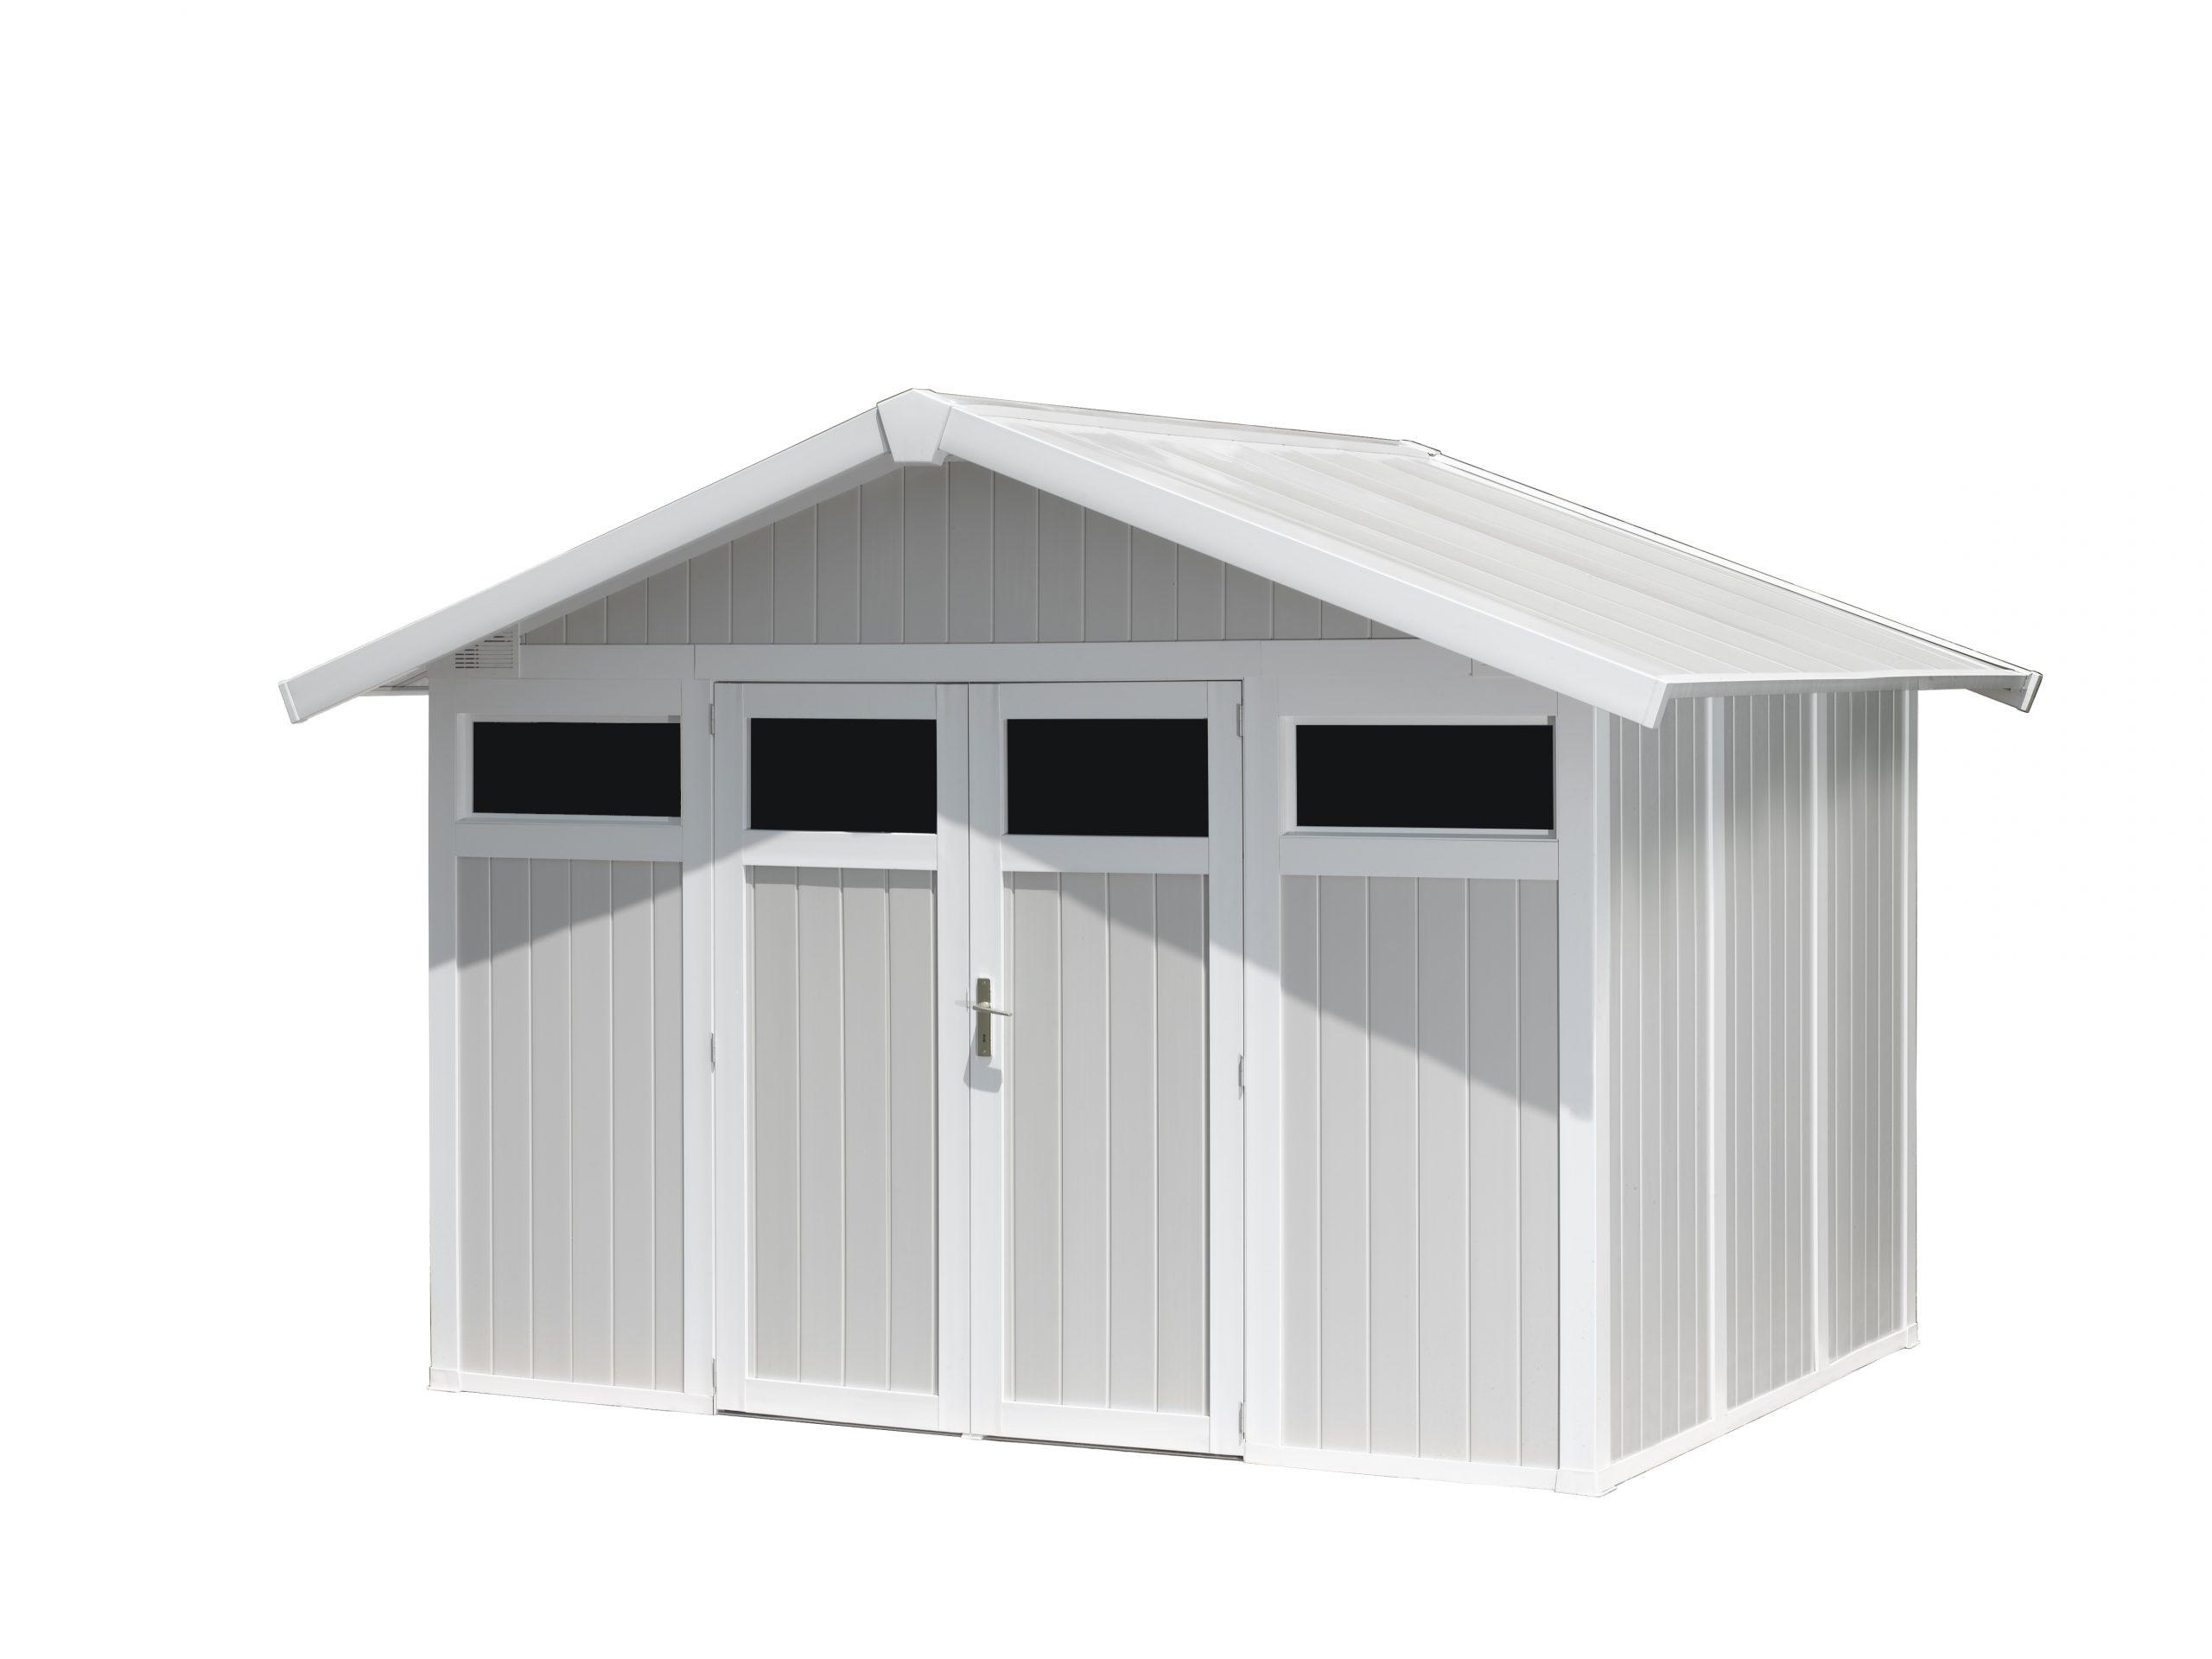 Utility Garden Shed 7,5 M² | Grosfillex tout Grosfillex Abri De Jardin Pvc